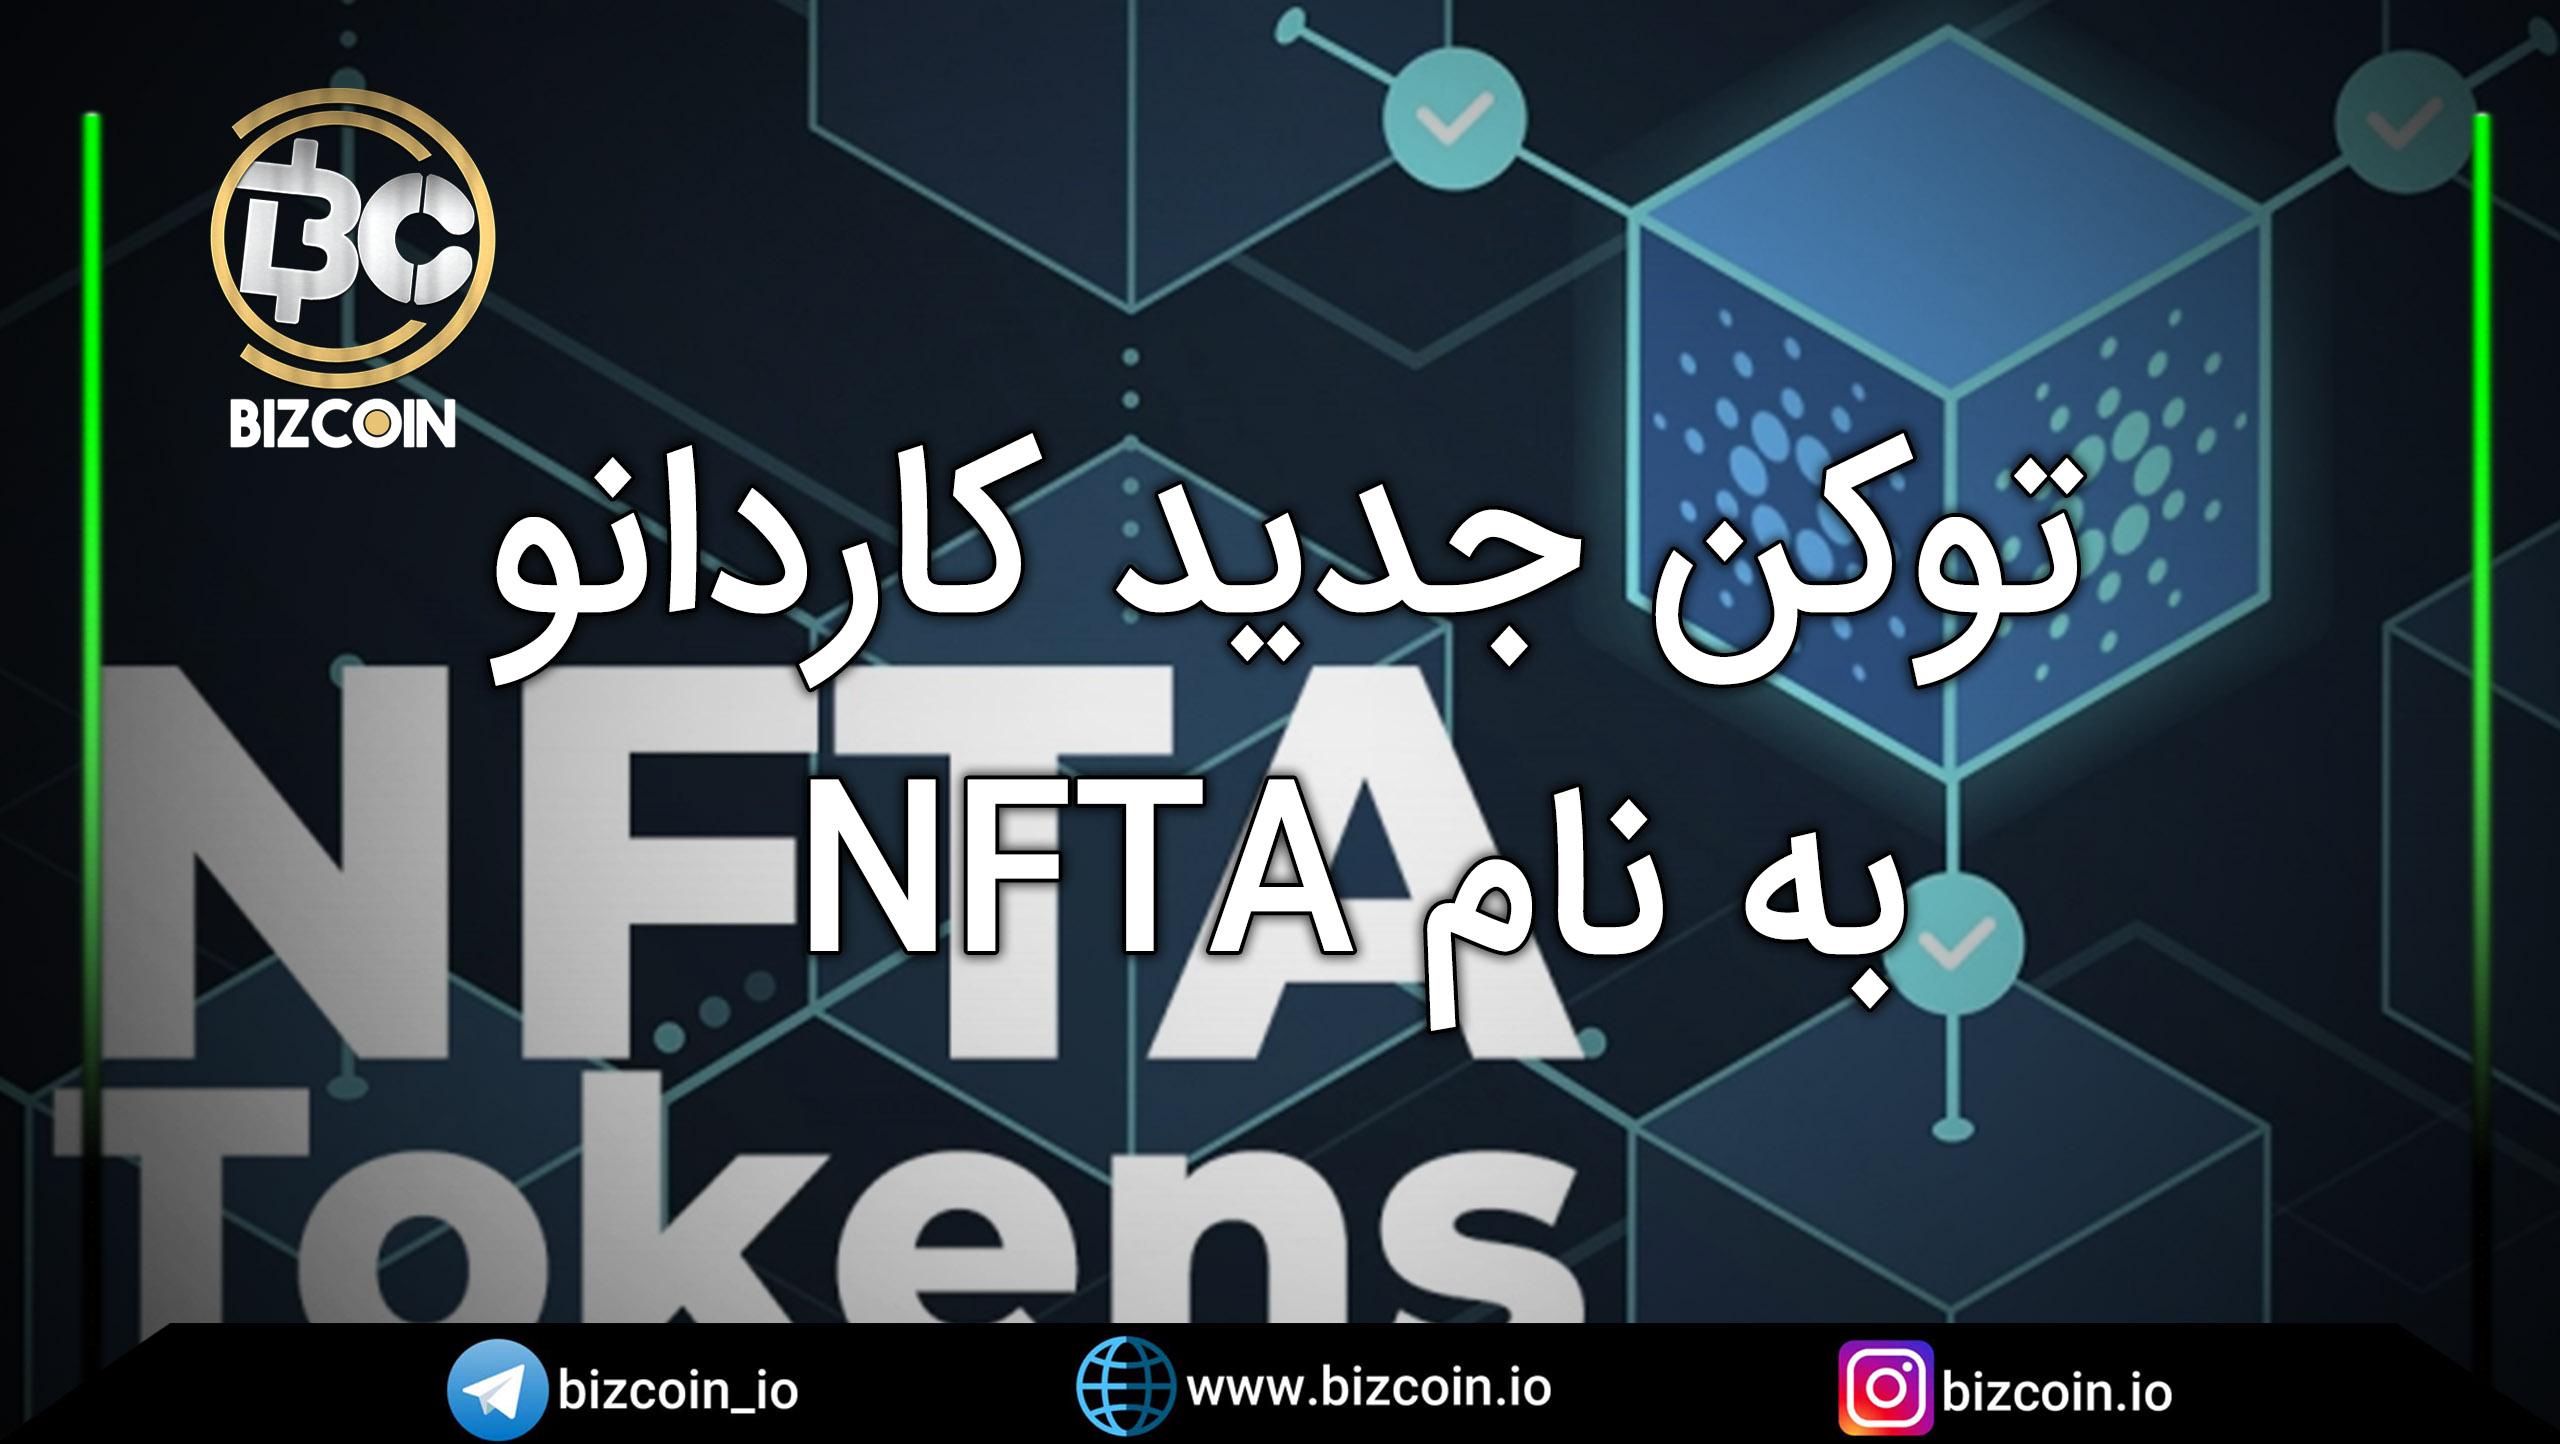 Cardano new token called NFTA توکن جدید کاردانو به نام NFTA